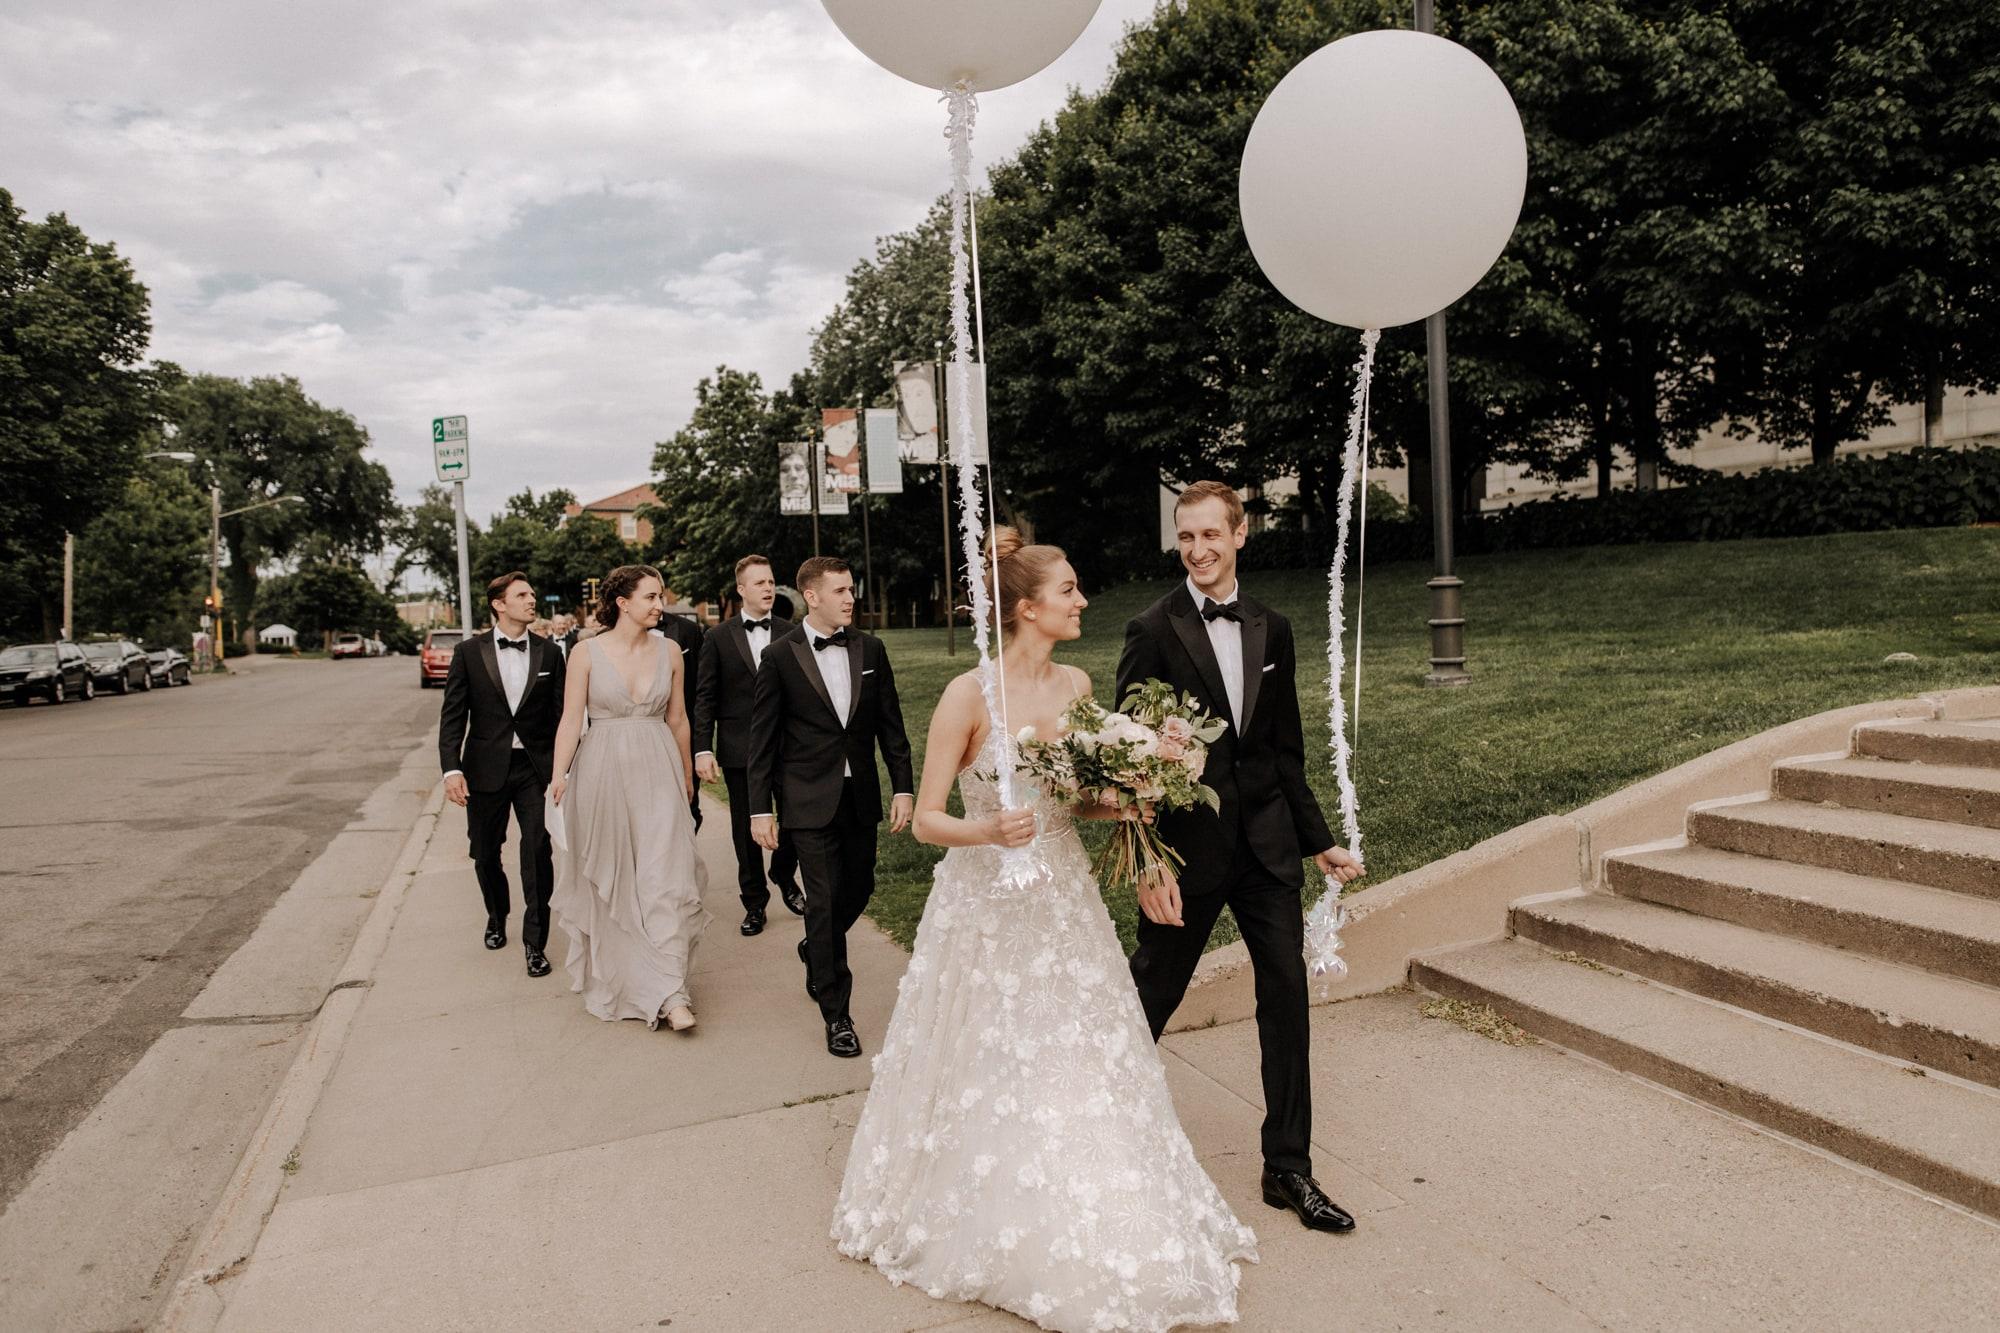 MIA-Minneapolis-Institute-Art-Summer-Wedding-_37.jpg